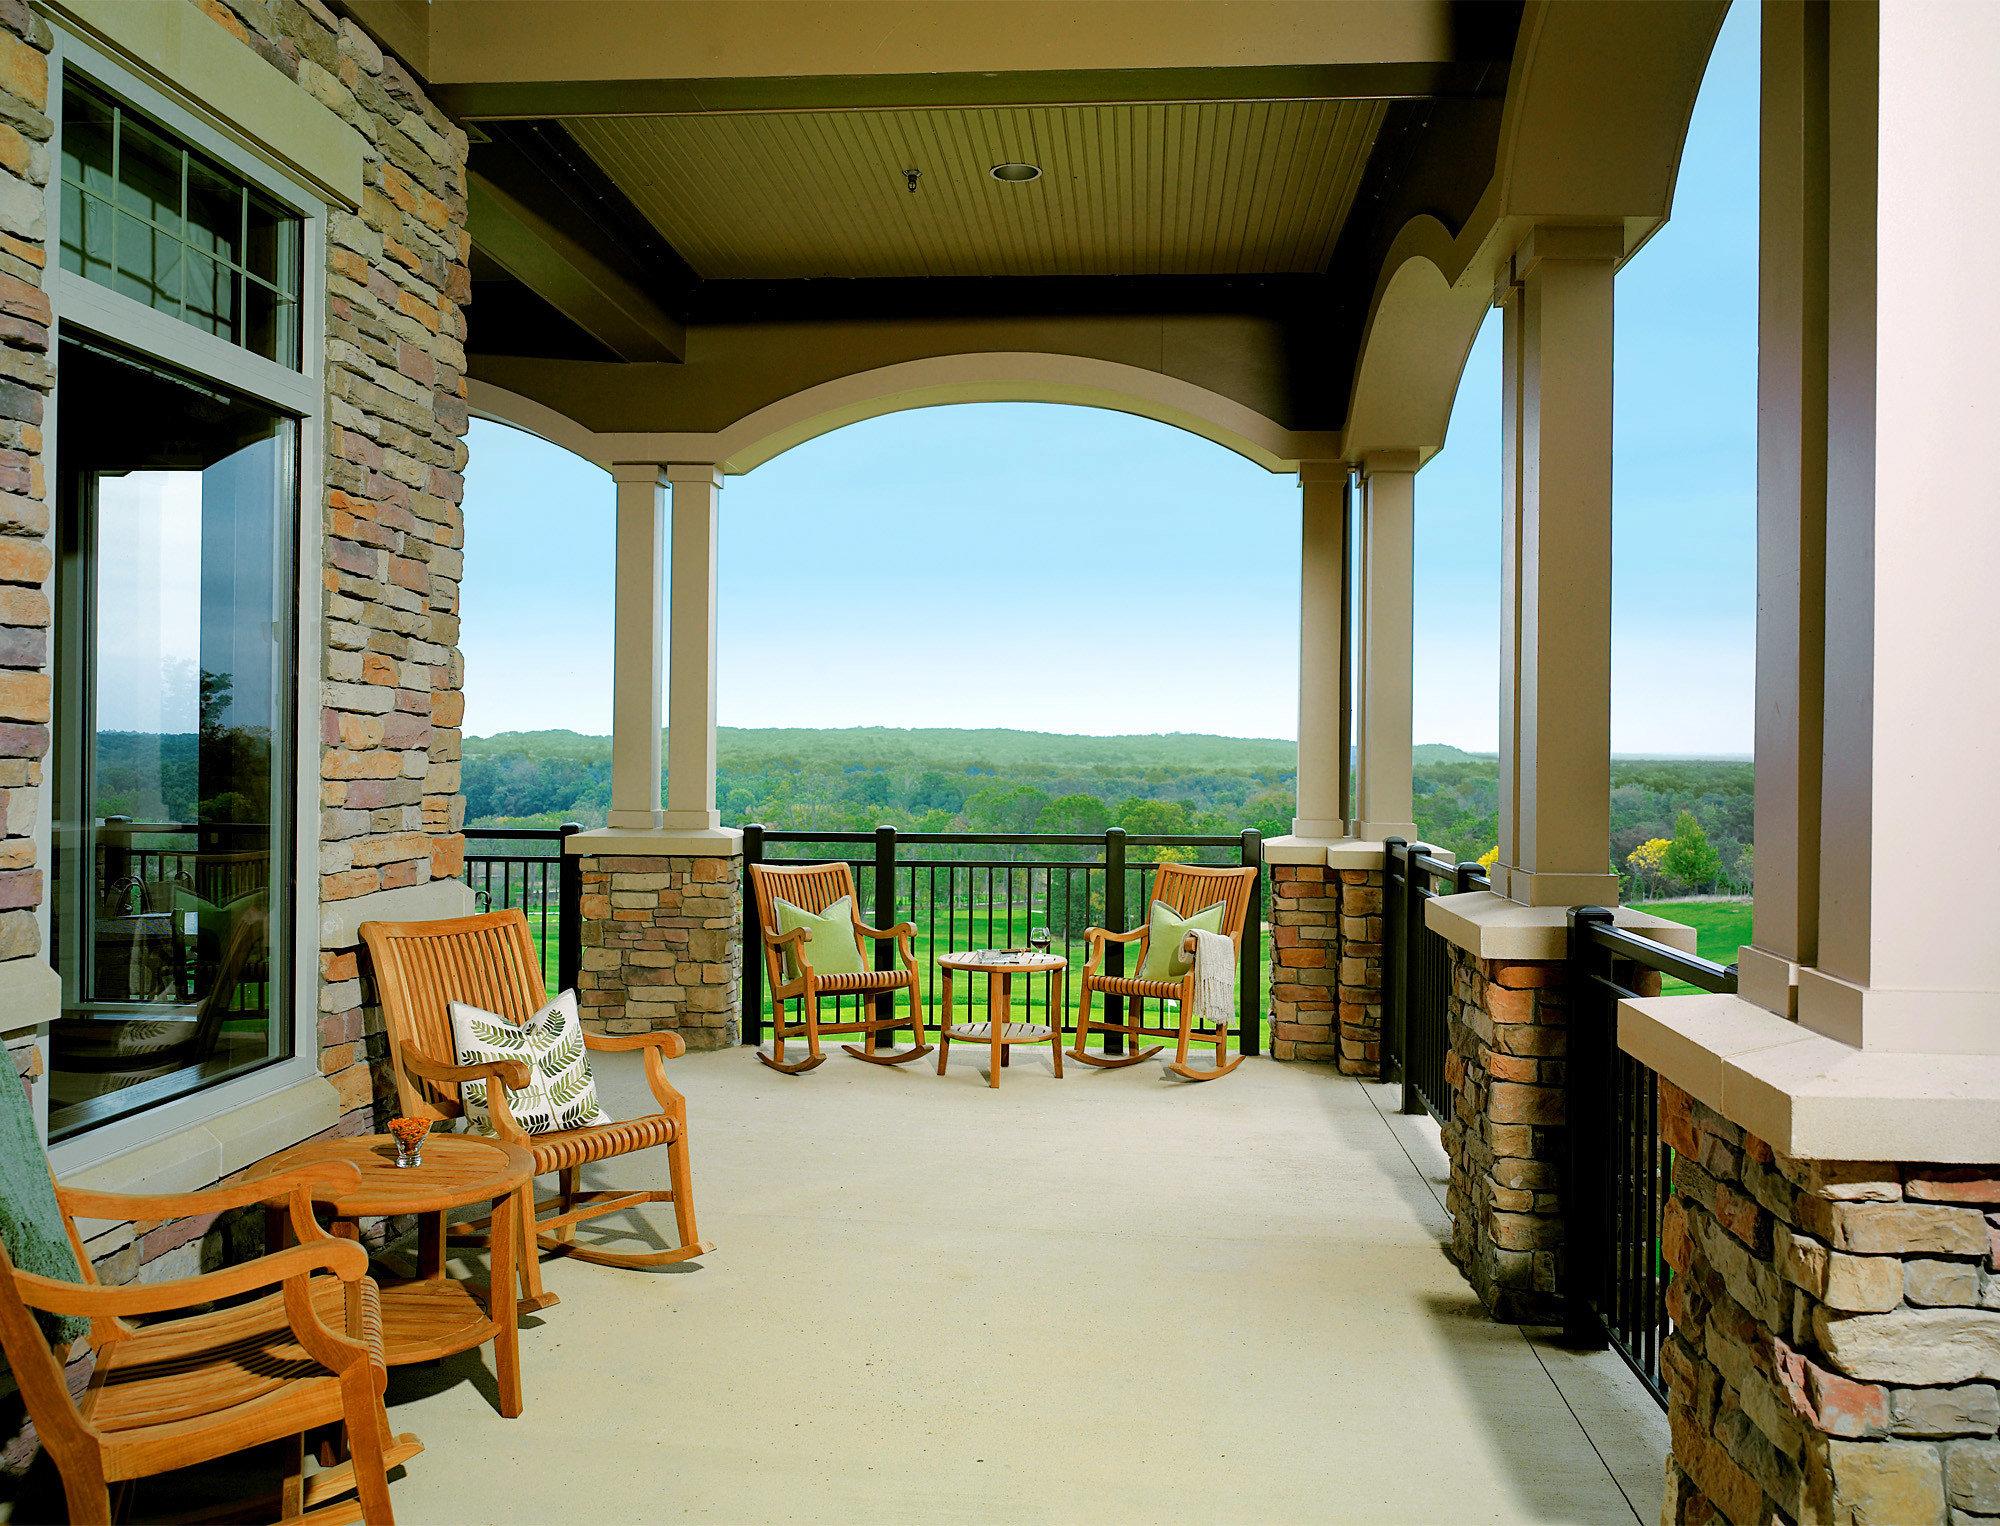 property house chair building home Architecture Resort condominium Villa cottage mansion living room restaurant porch